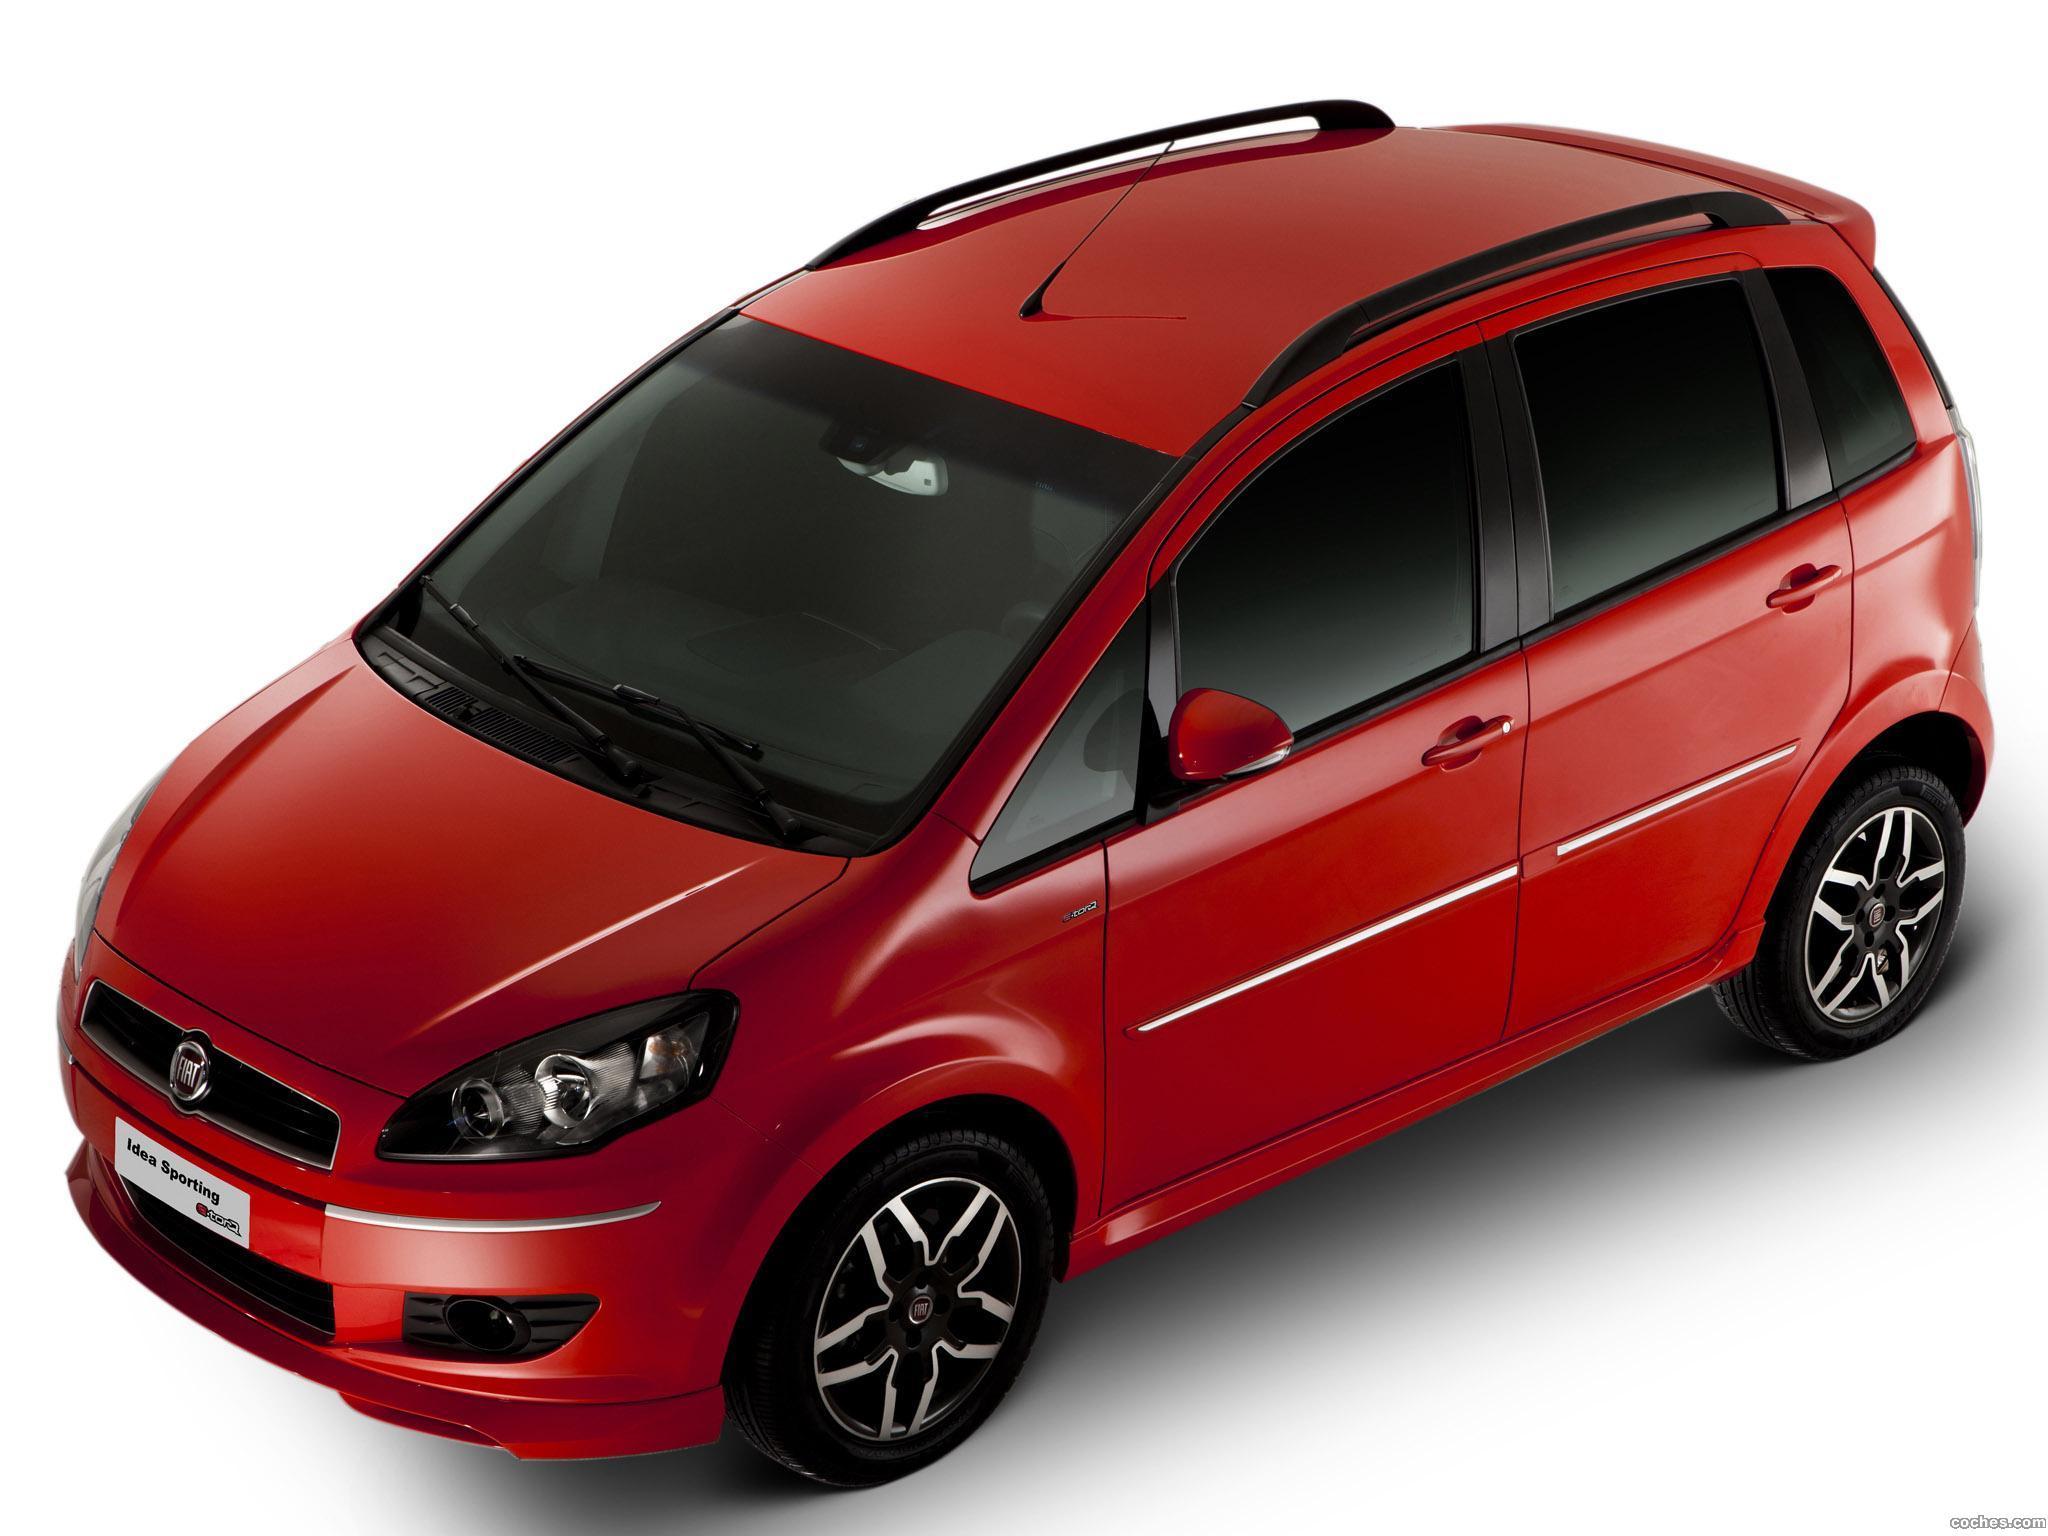 Foto 15 de Fiat Idea Sporting 2010